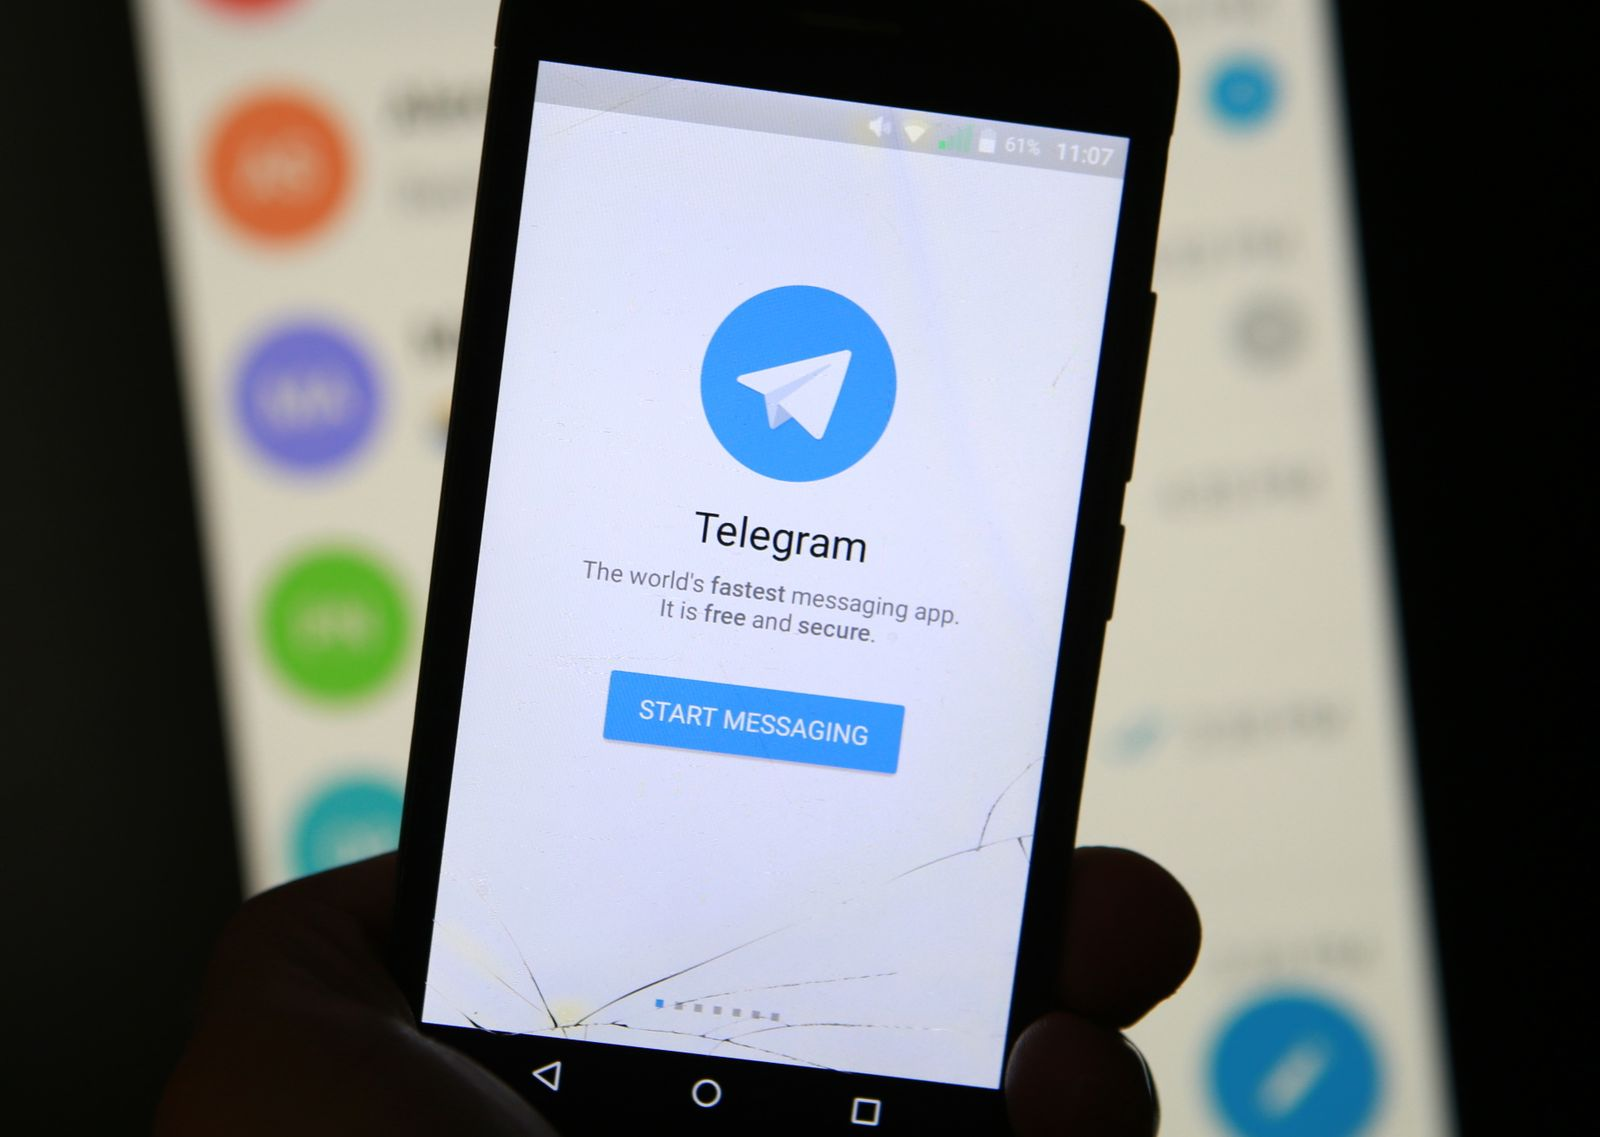 Messengerdienst Telegram